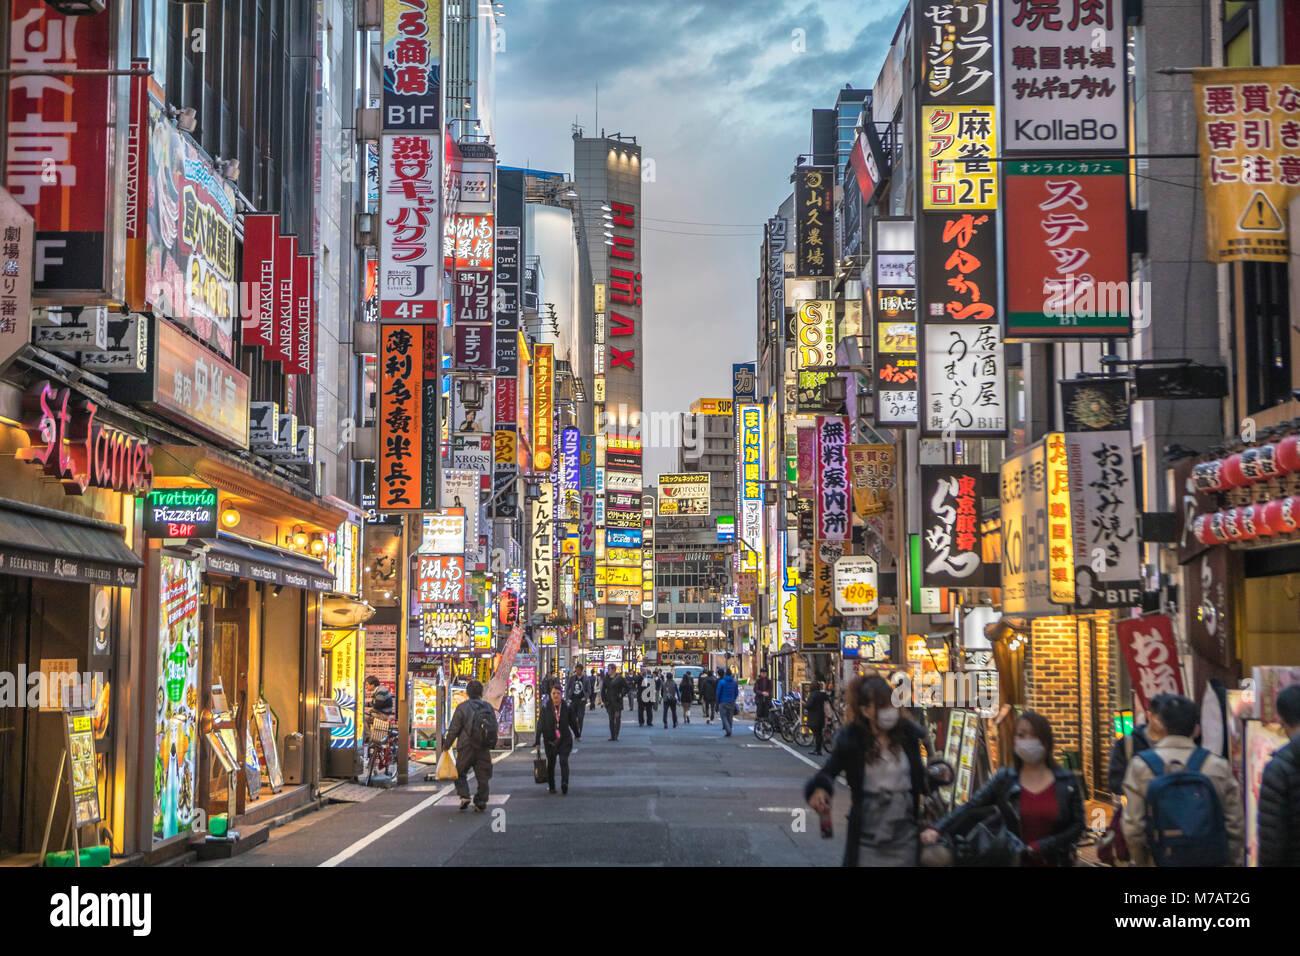 Japan, Tokyo City, Shinjuku district, Kabukicho, Stockbild